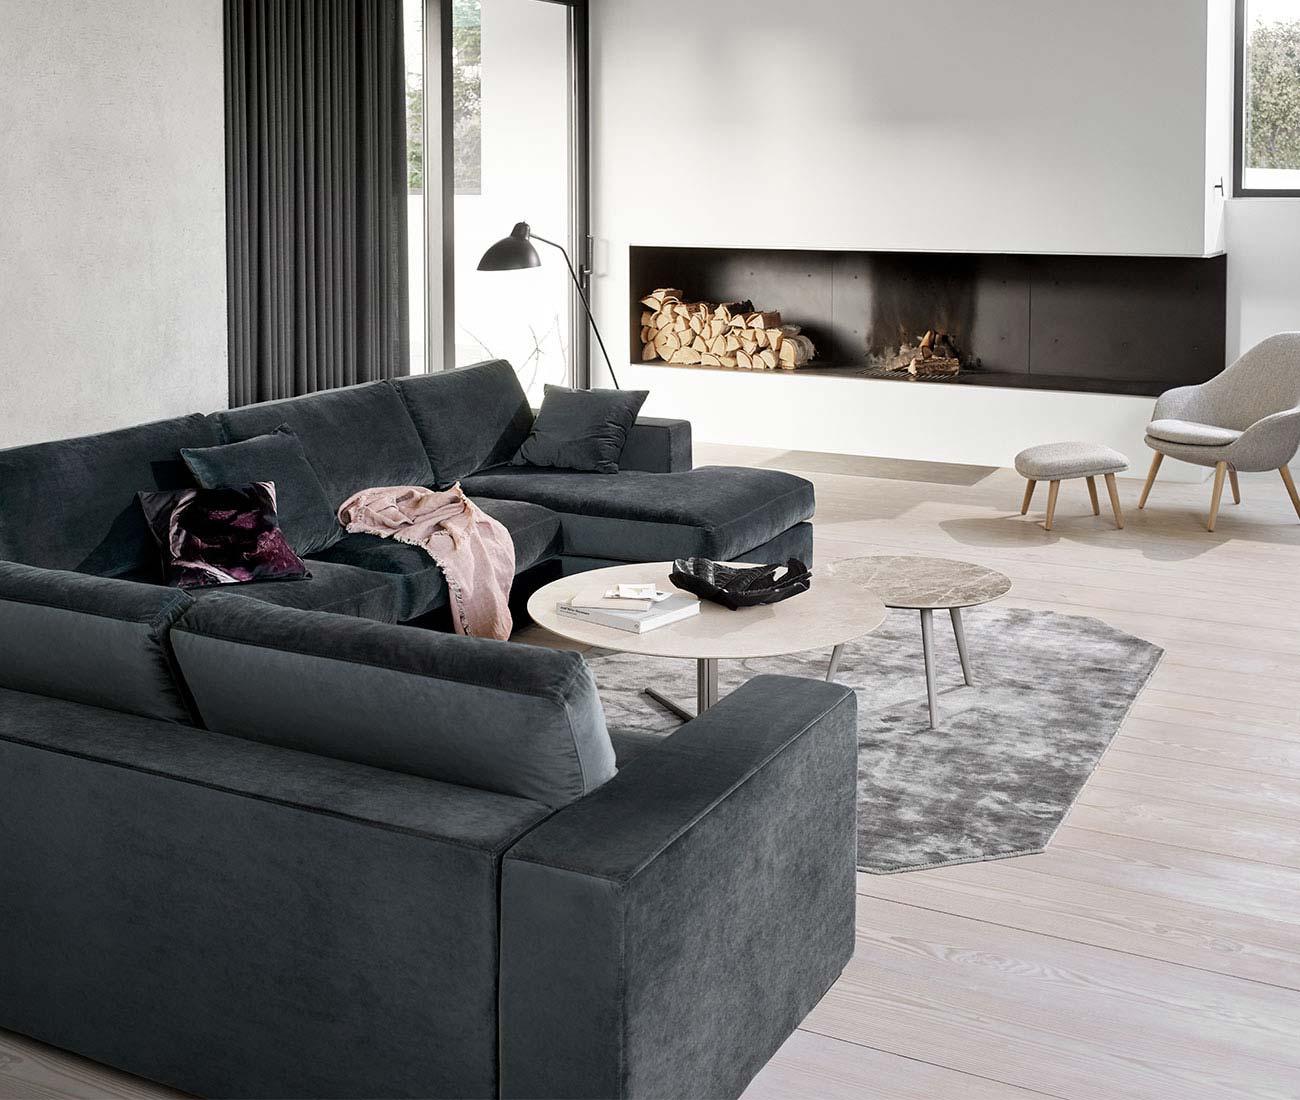 What's your corner sofa?